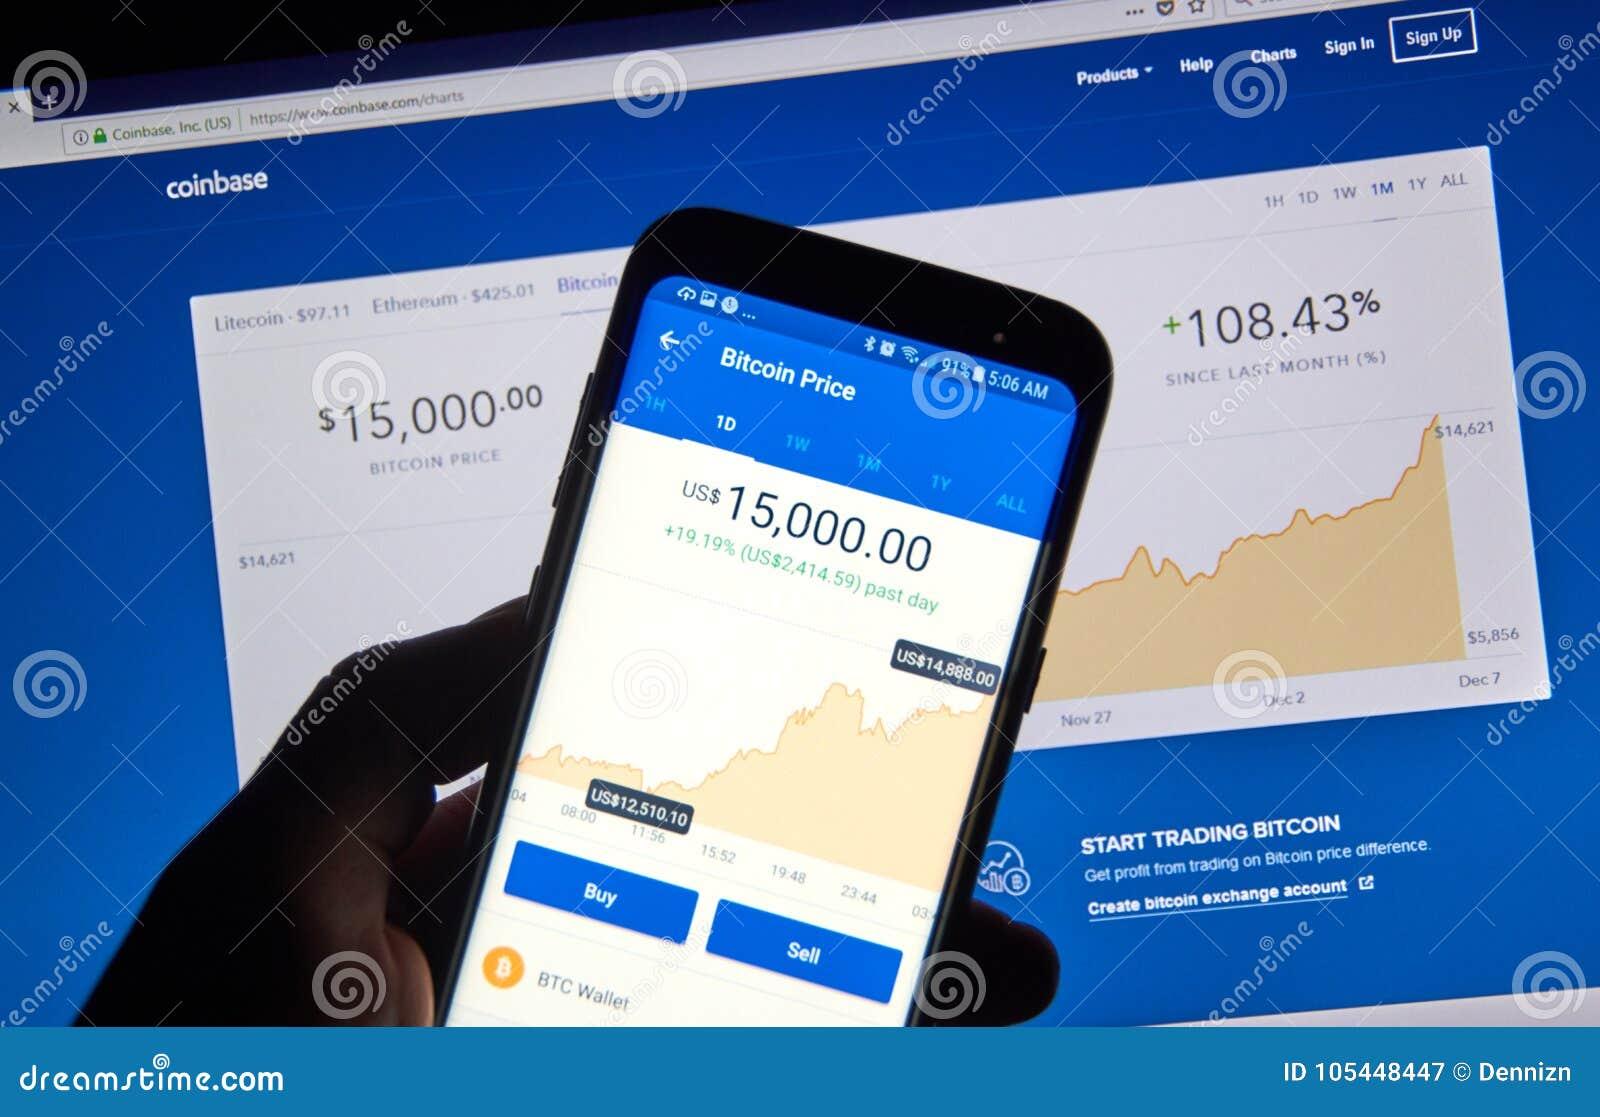 trade satoshi btcp villa bitcoin trading schwab